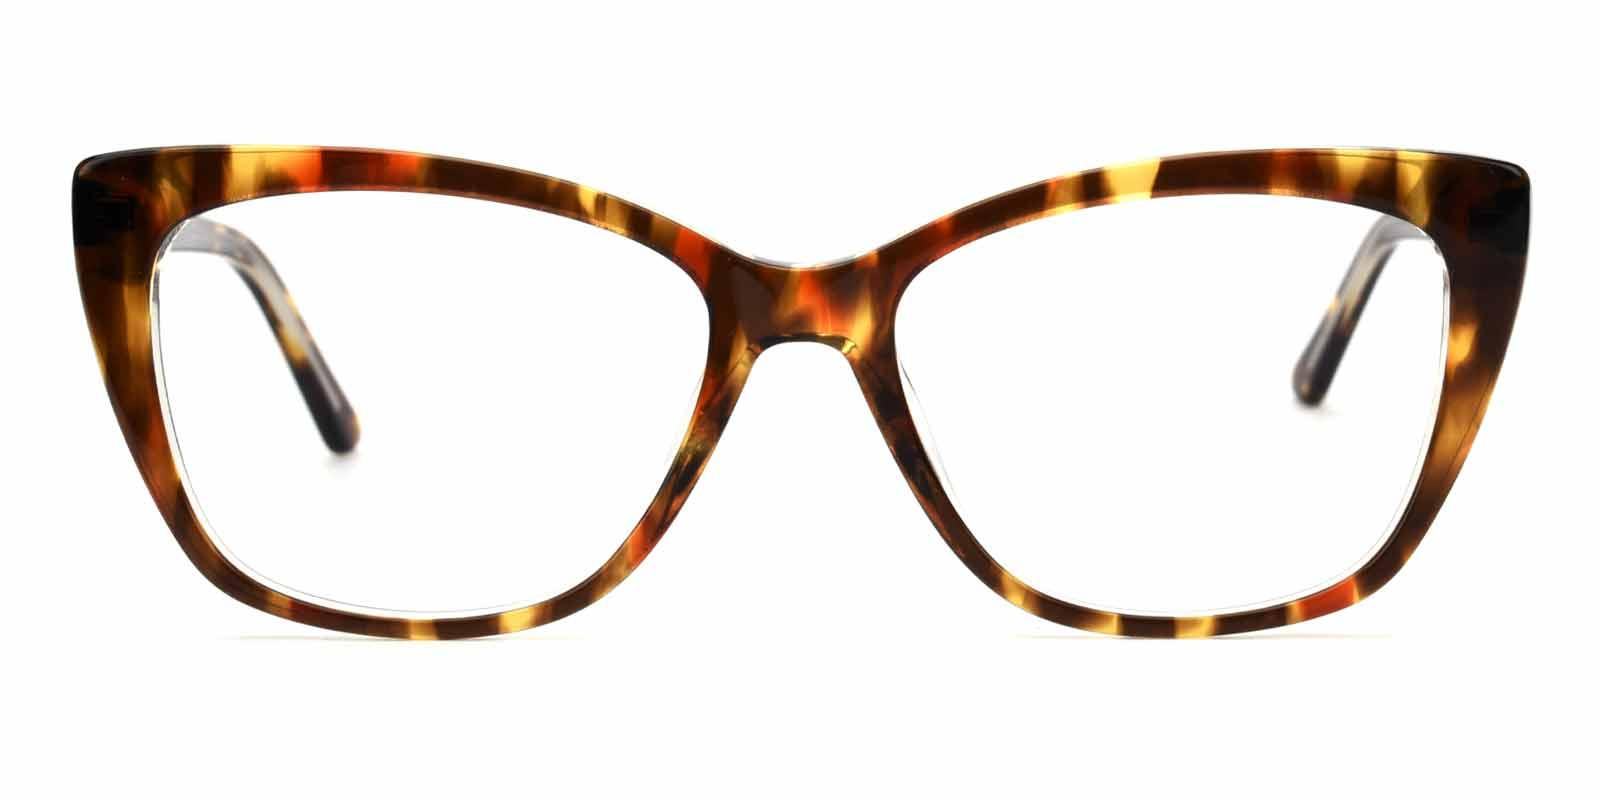 Kiko-Tortoise-Cat-Acetate-Eyeglasses-additional2